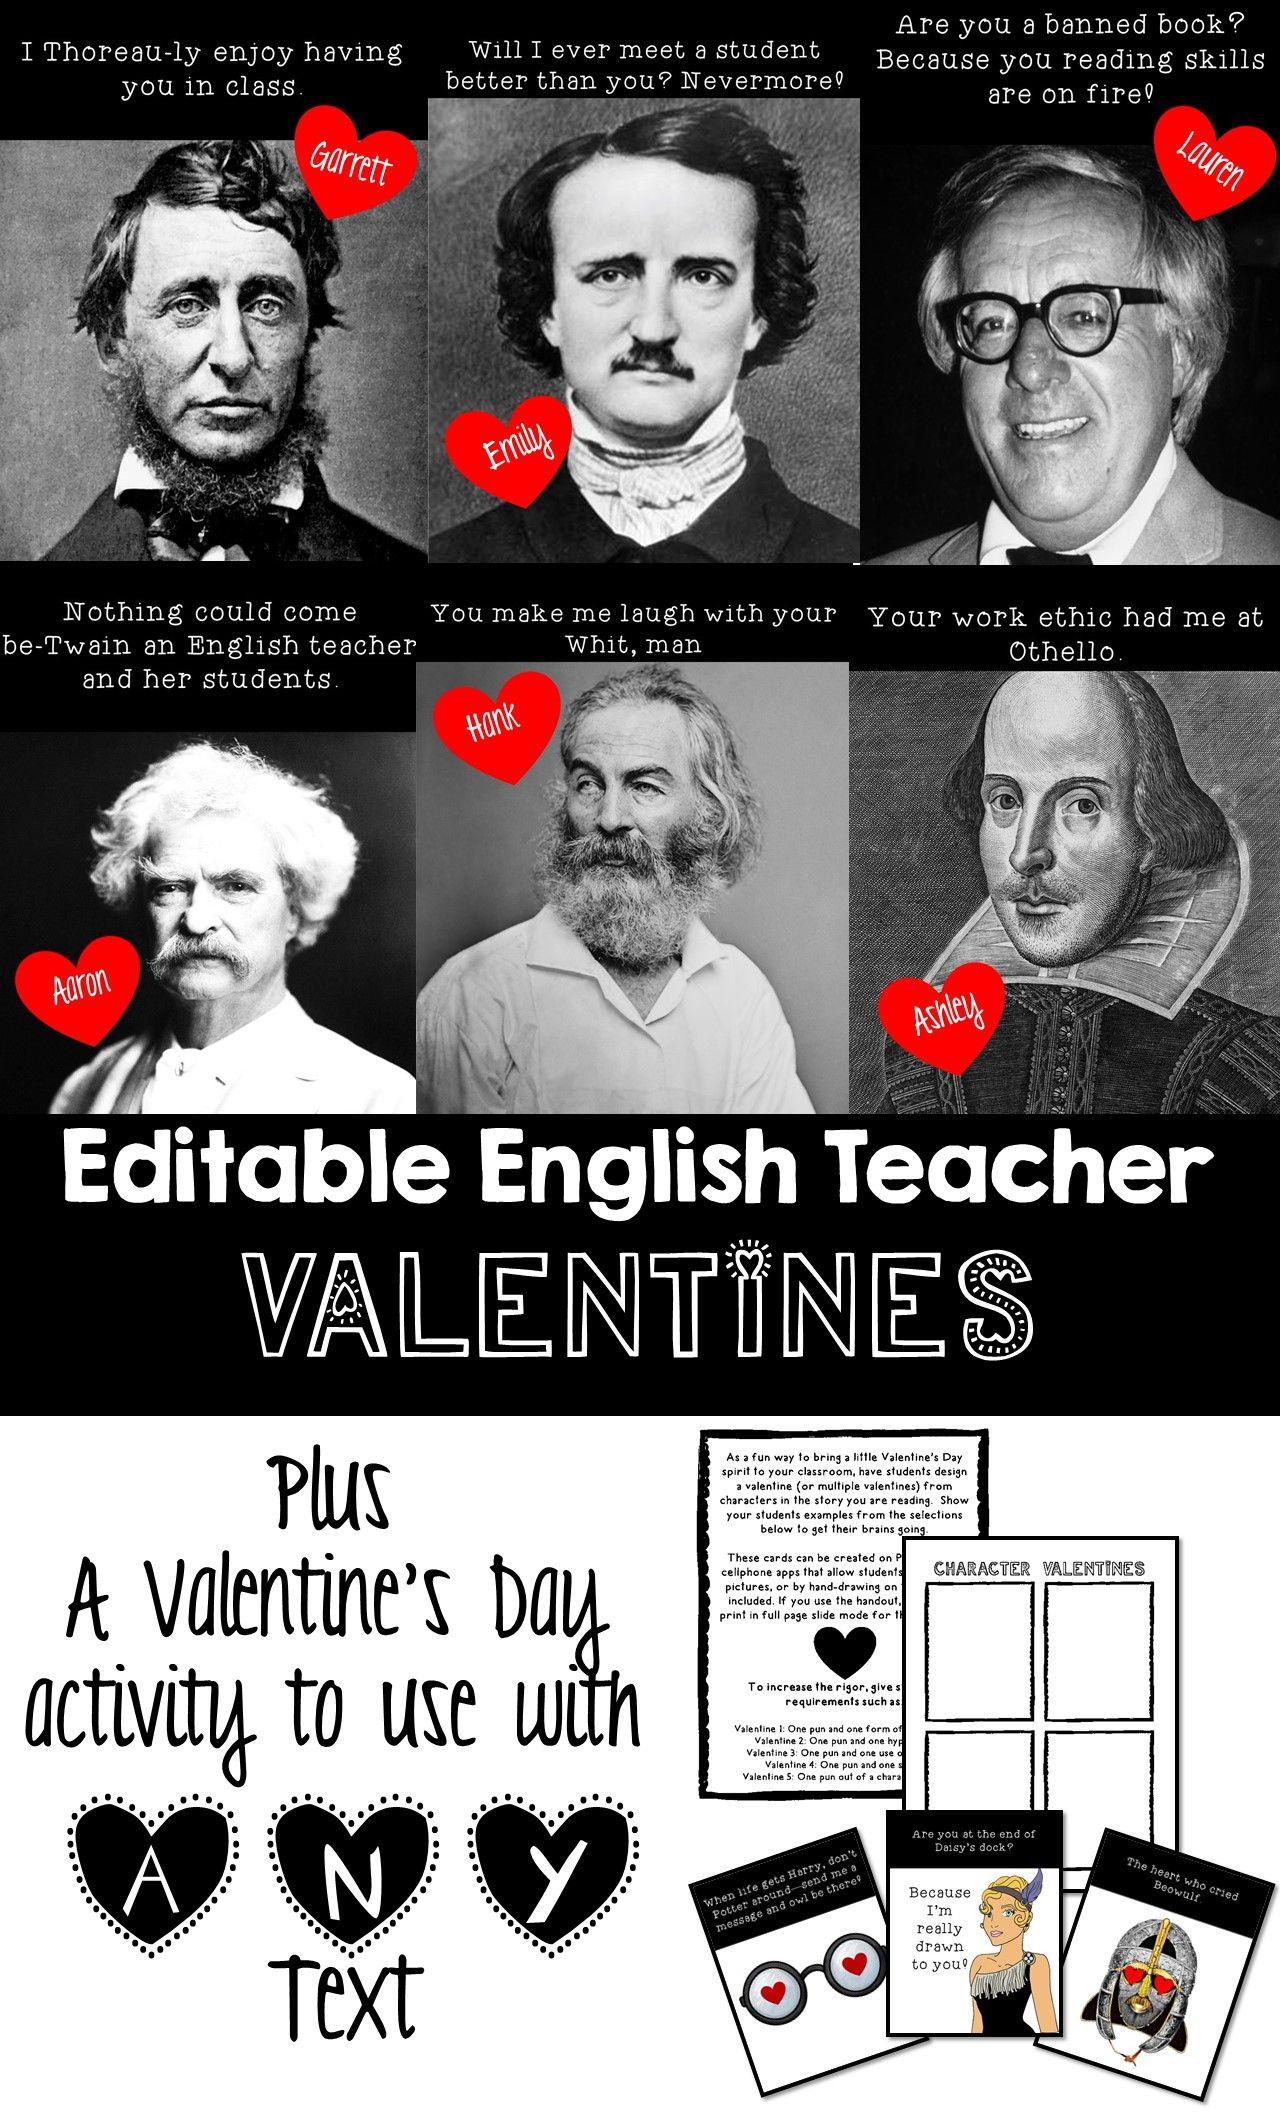 English Teacher Valentines Plus A Valentine S Day Activity For Any Text English Teacher Valentines Valentines Day Activities English Teacher